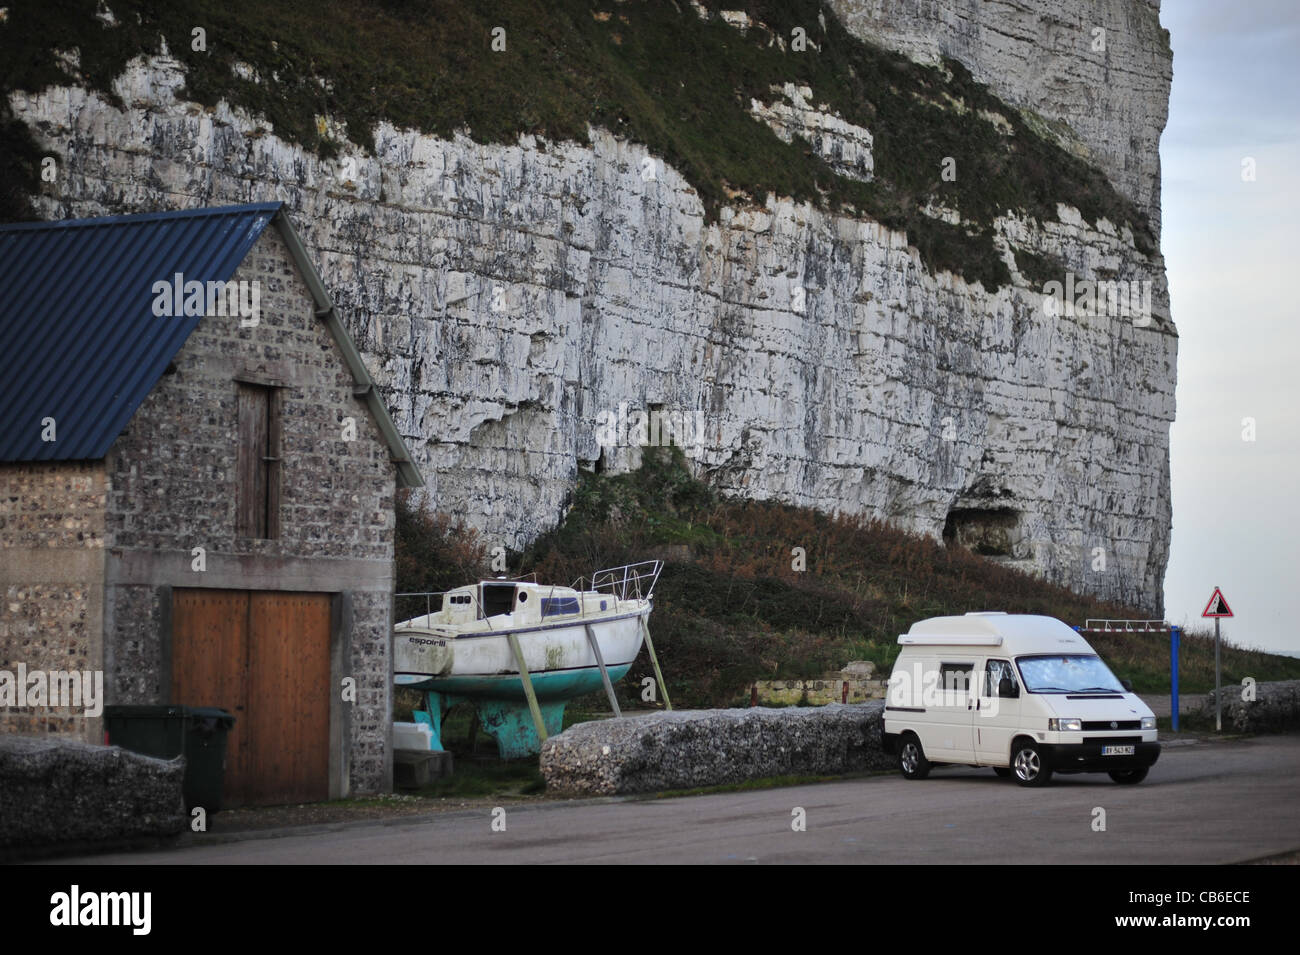 Normandy, Saint Valery en Caux town, camper on seaside,  falling rocks road sign, at dawn - Stock Image